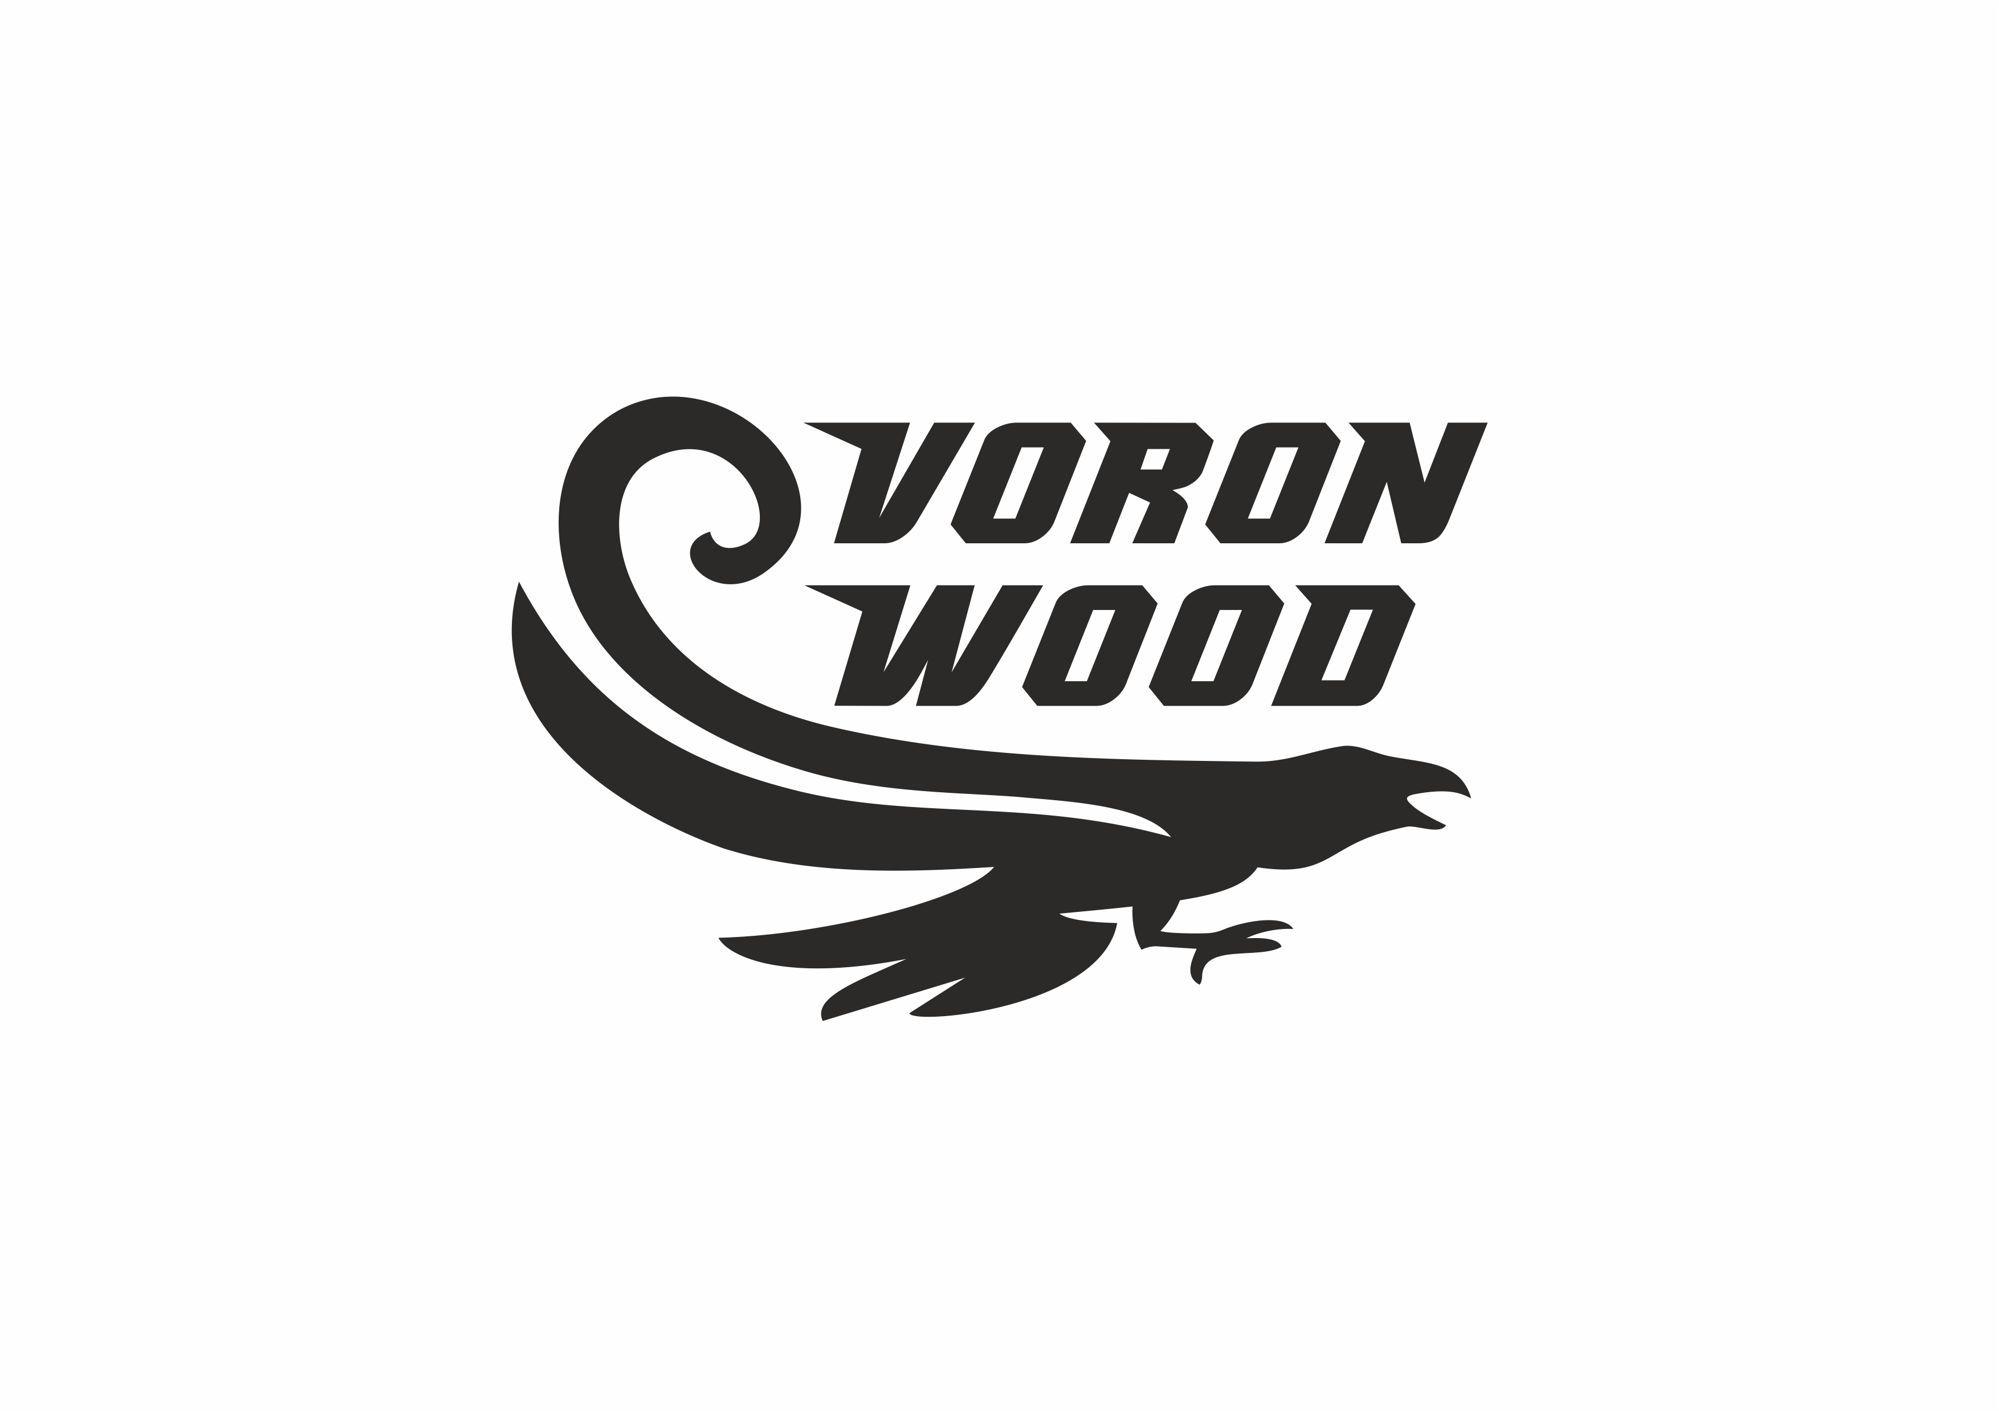 Логотип для Voron-Wood - дизайнер rowan